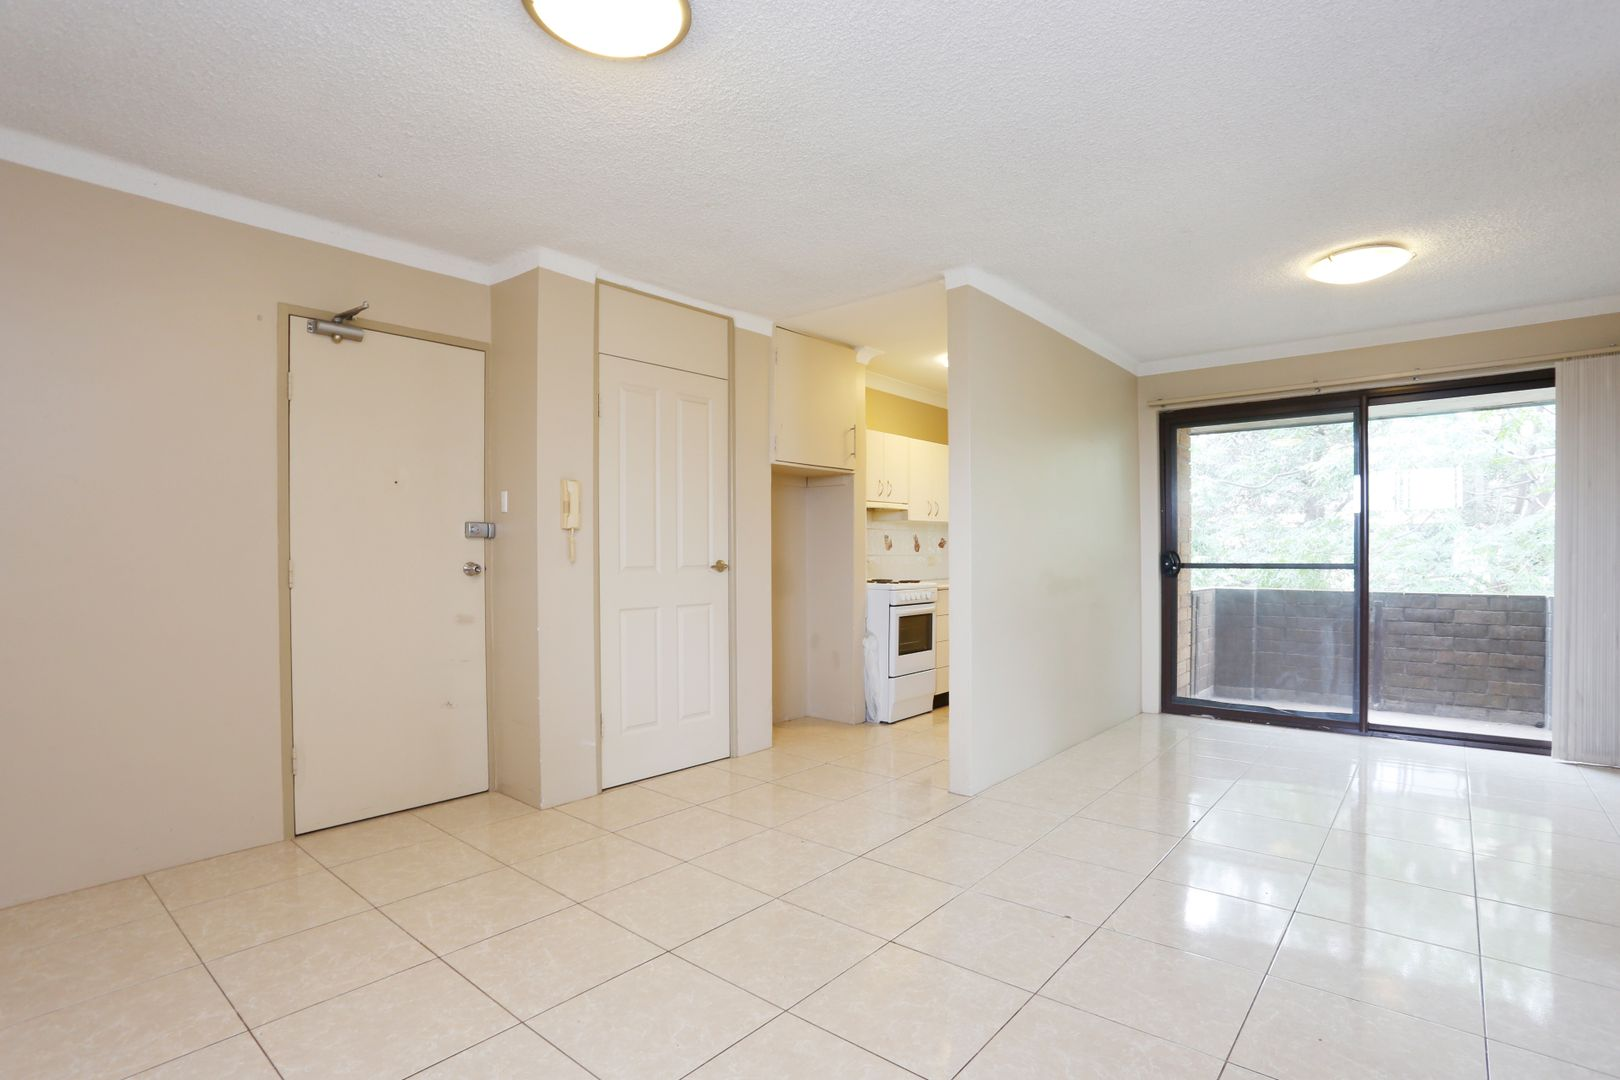 18/22 Price Street, Ryde NSW 2112, Image 0